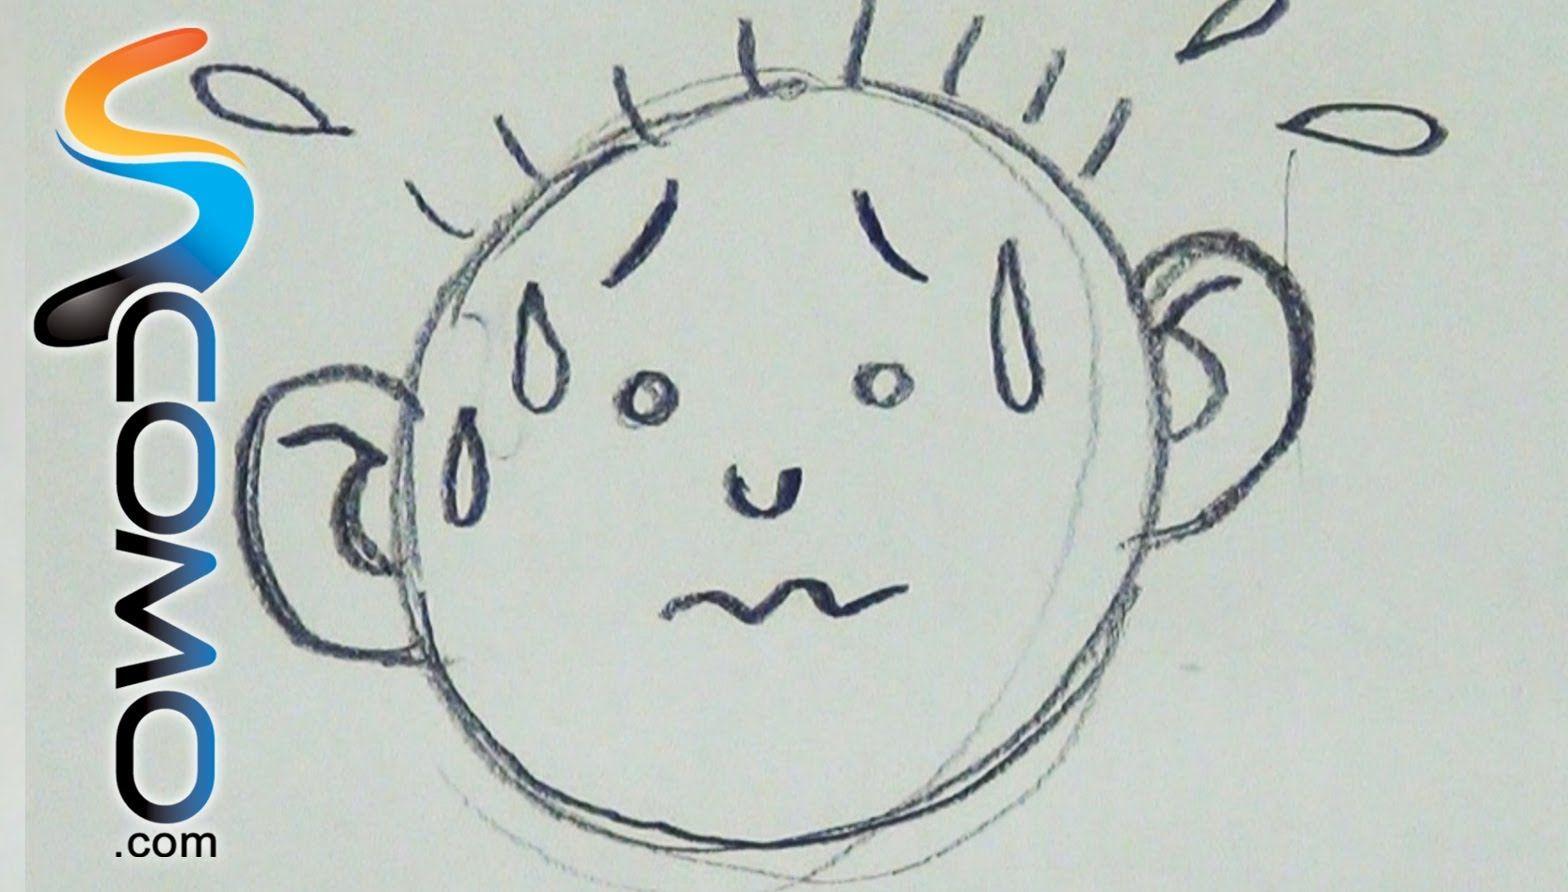 Dibujar Expresion De Miedo Draw Worry Faces Caras De Miedo Miedos Miedo